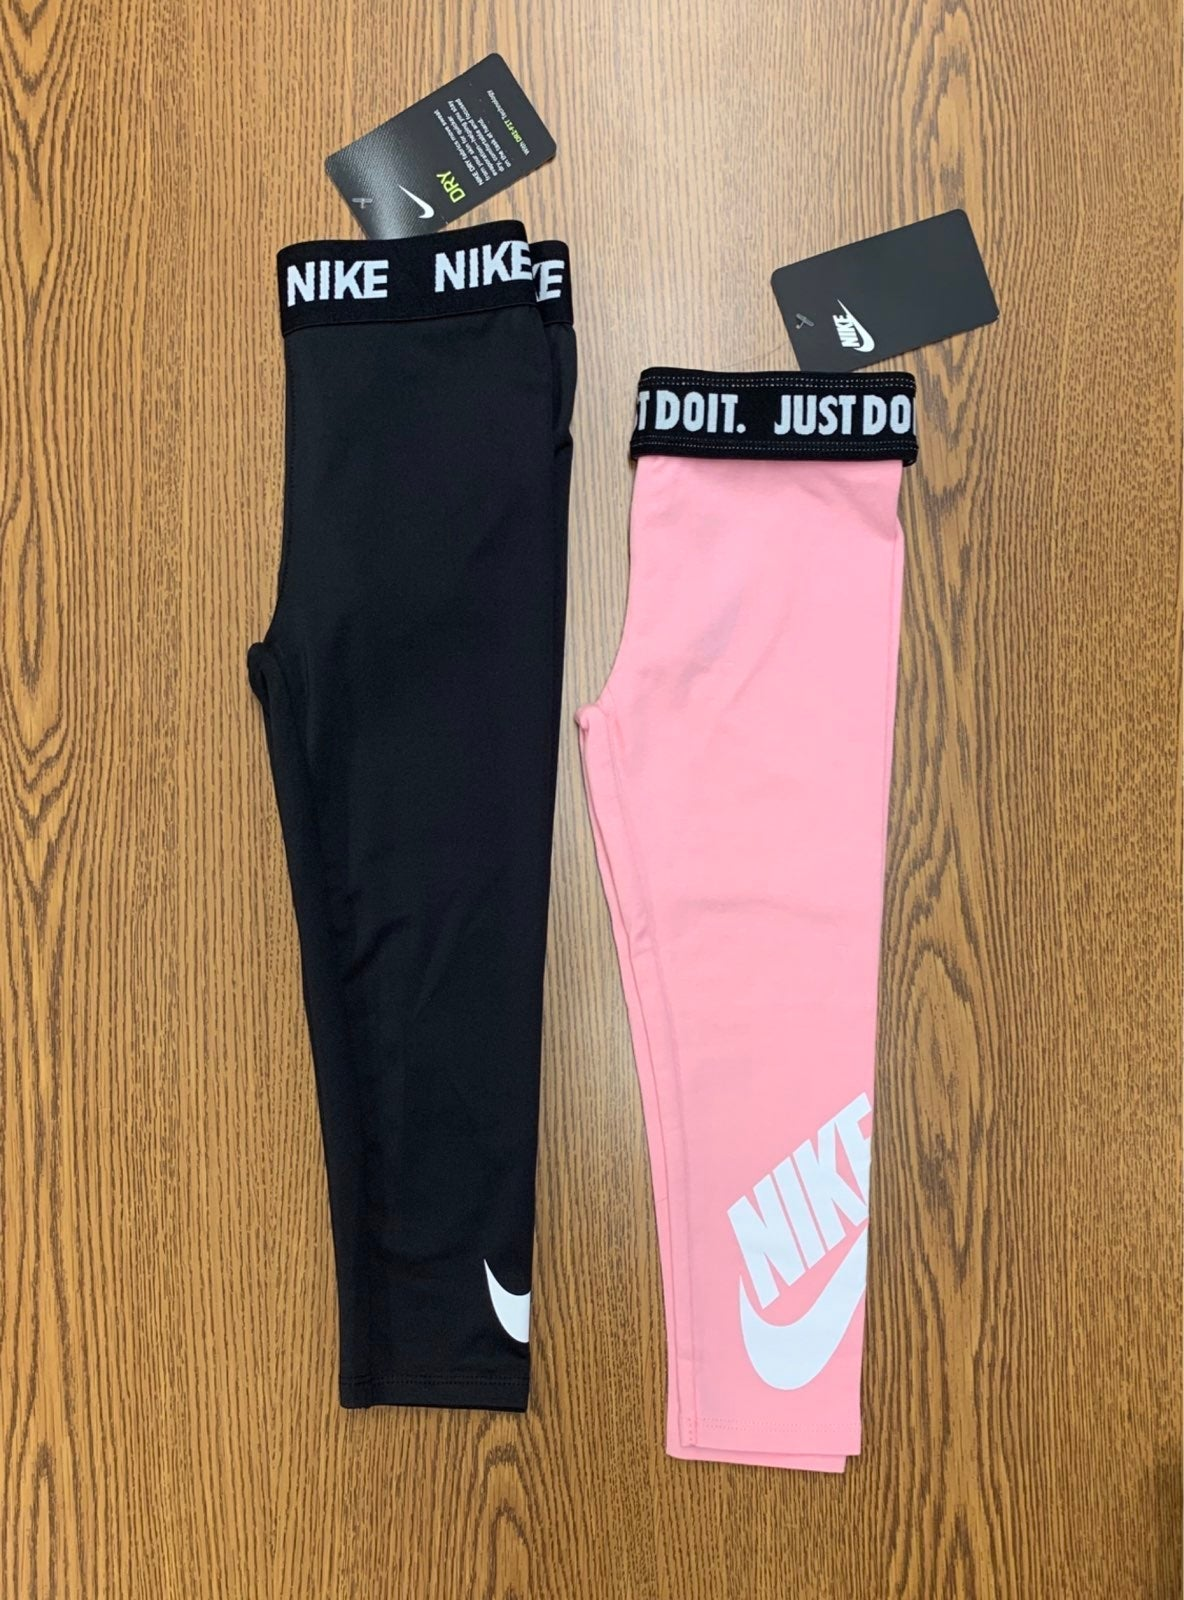 Nike Toddler Girls Leggings 4T NWT